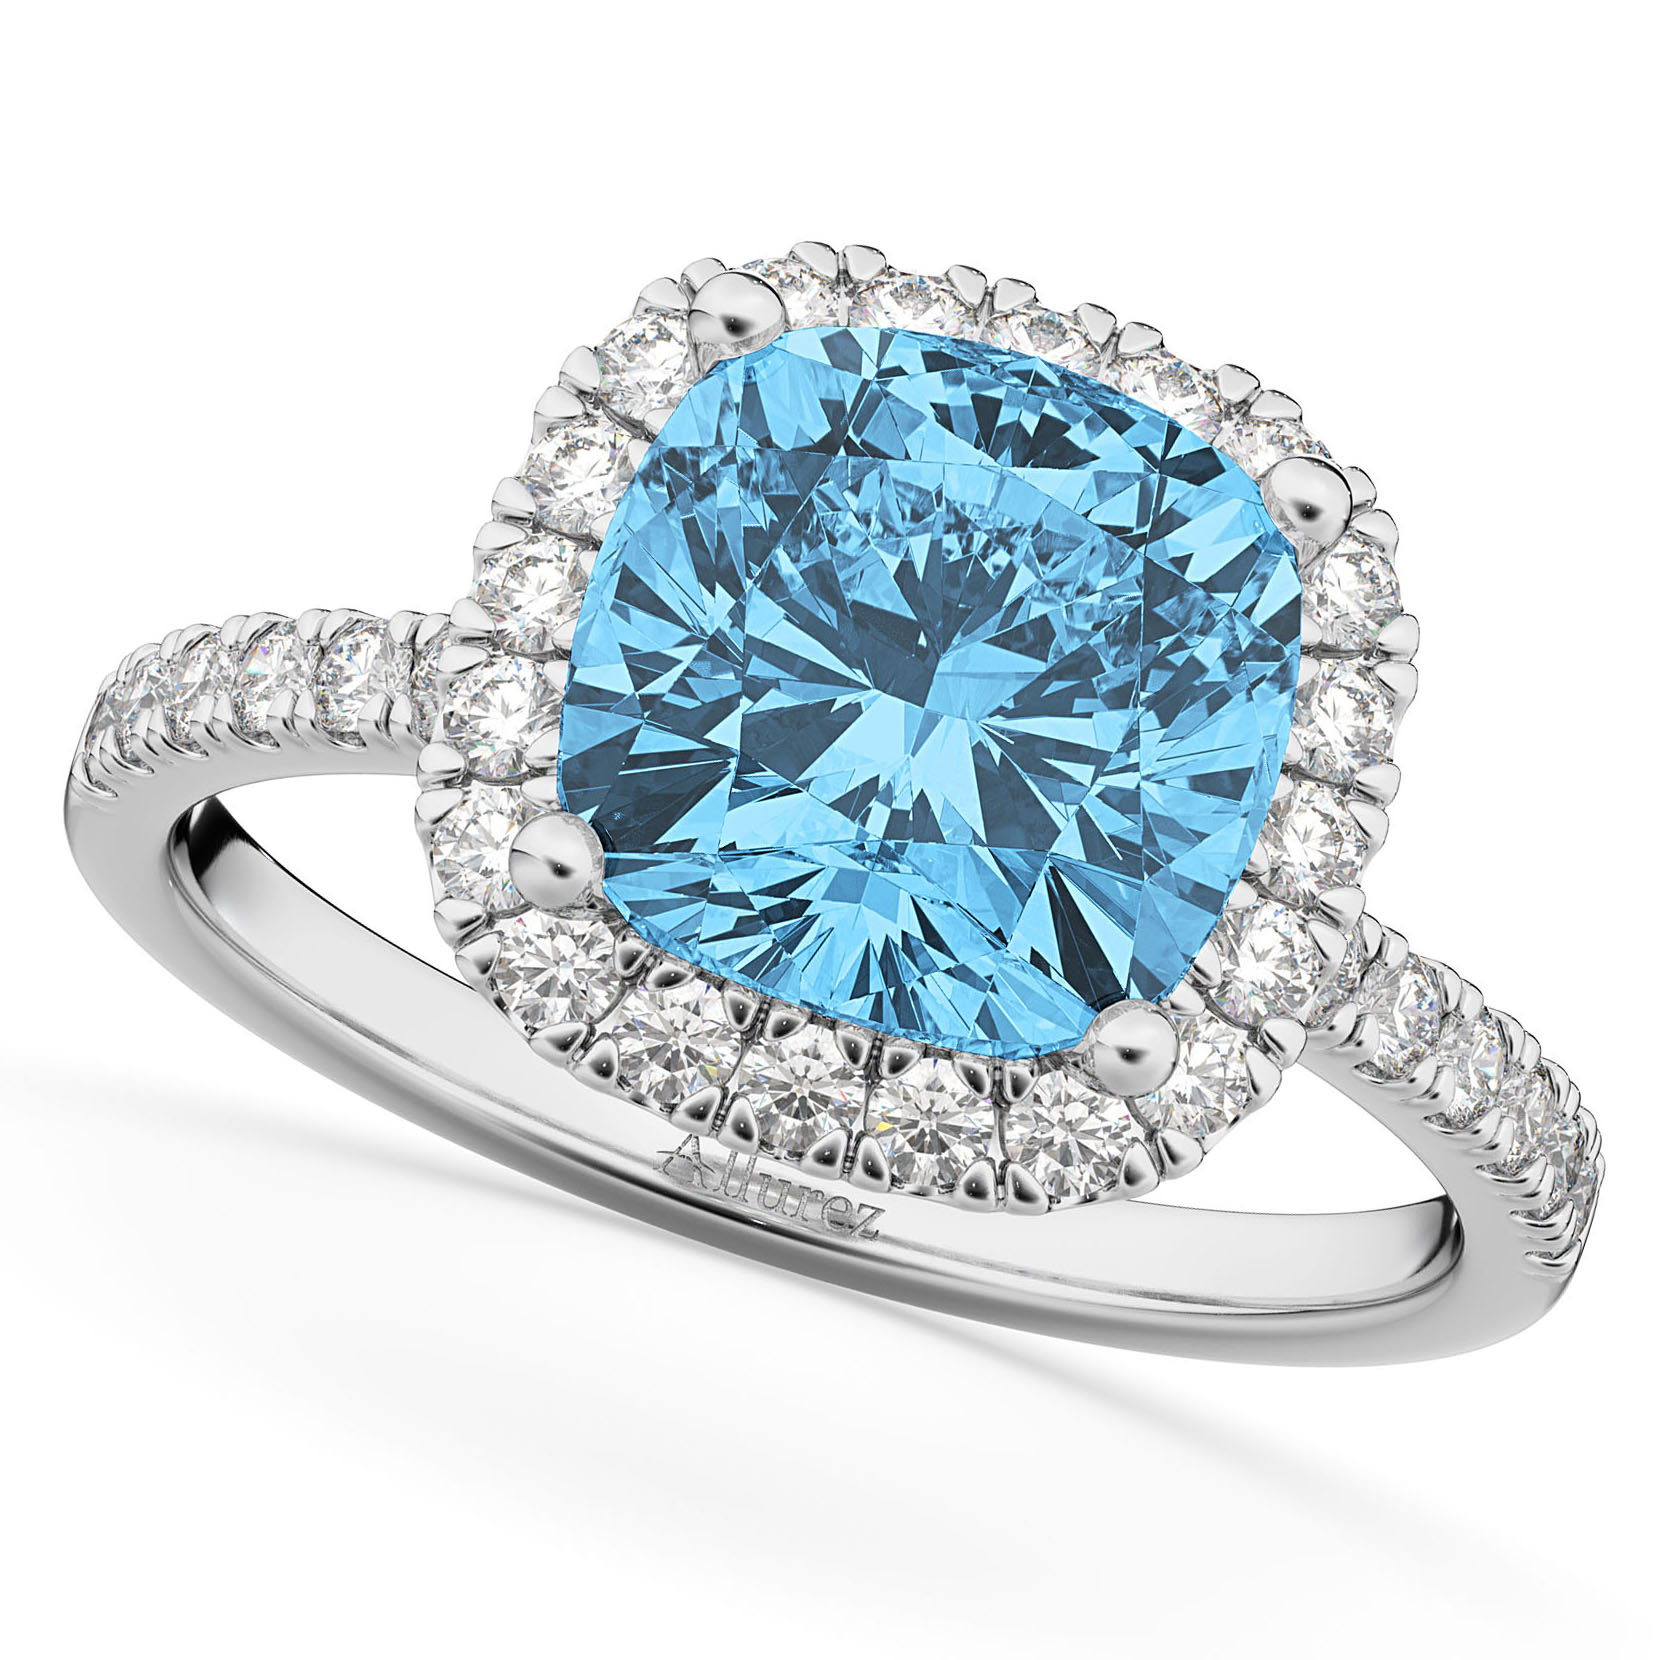 Cushion Cut Halo Blue Topaz & Diamond Engagement Ring 14k White Gold by Allurez.